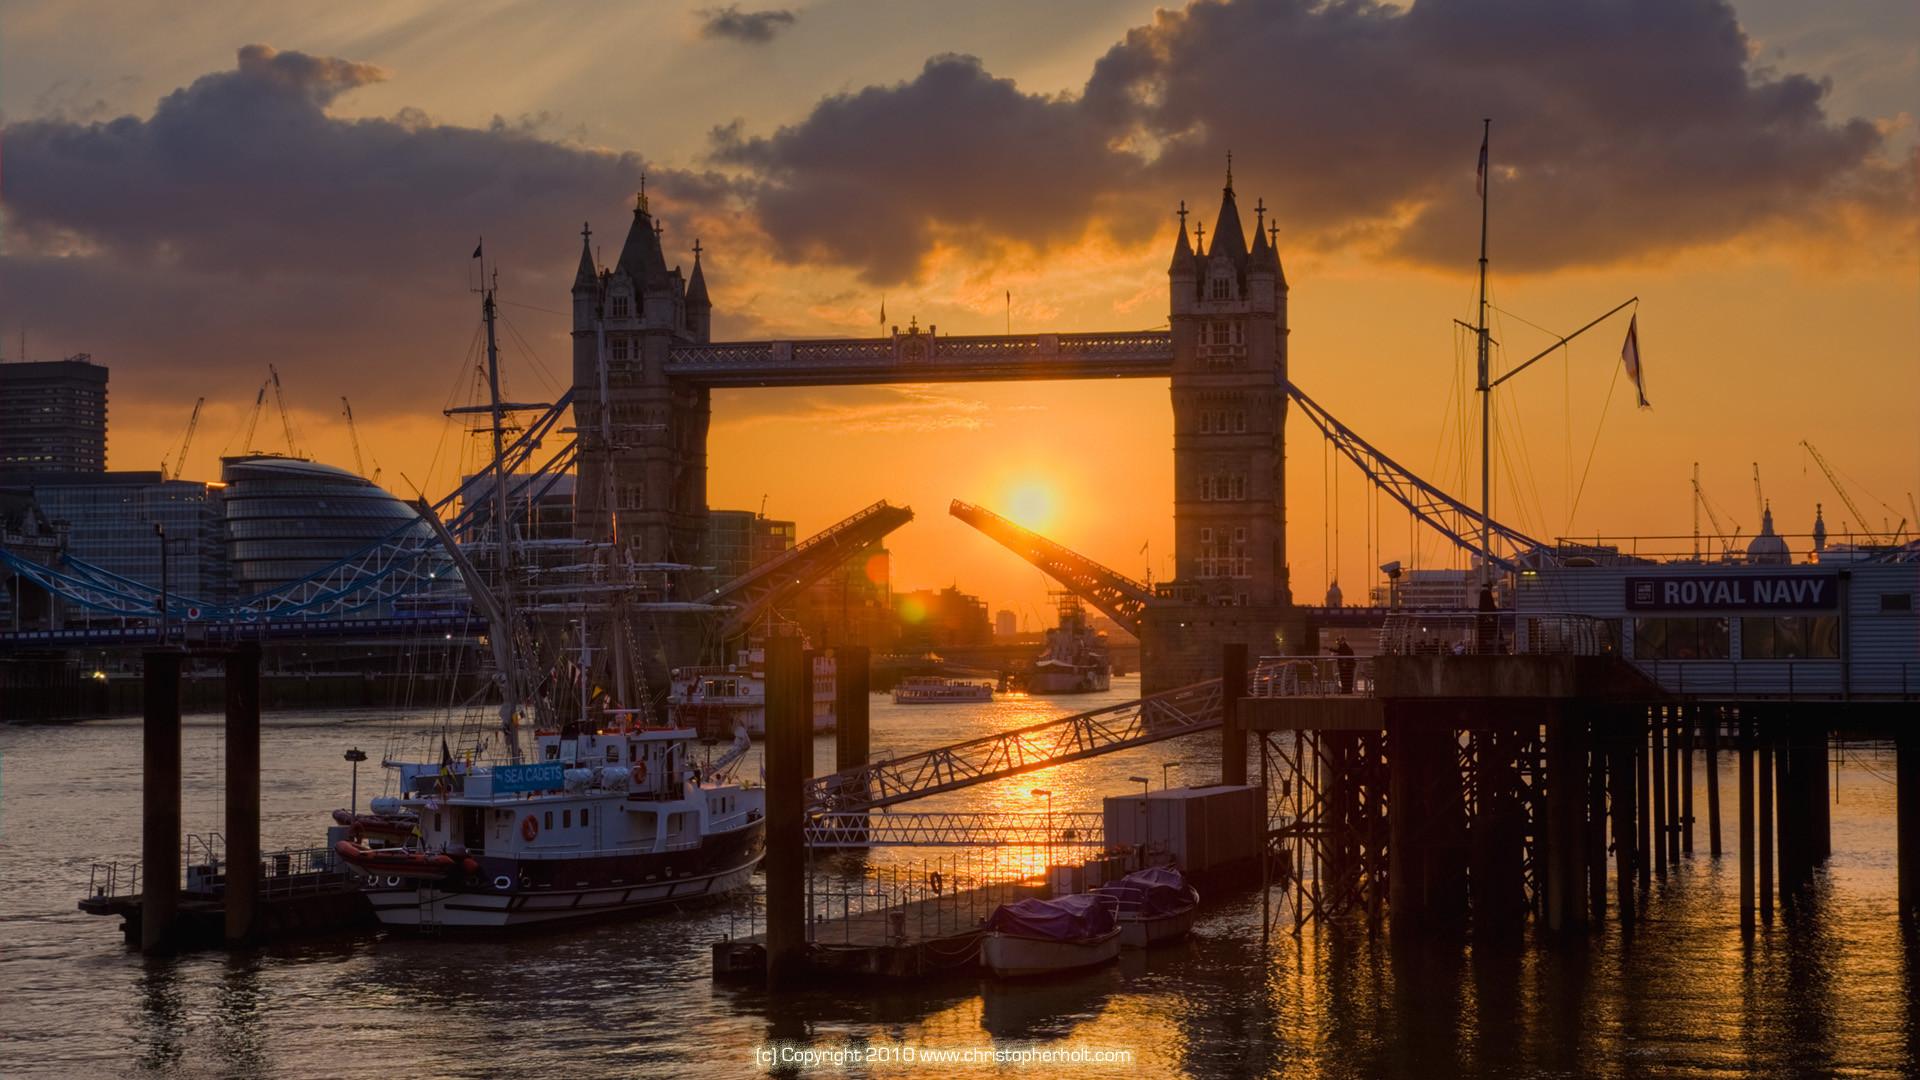 Download Wallpaper 1920x1080 River Sunset Bridge: London Bridge Wallpaper (59+ Images